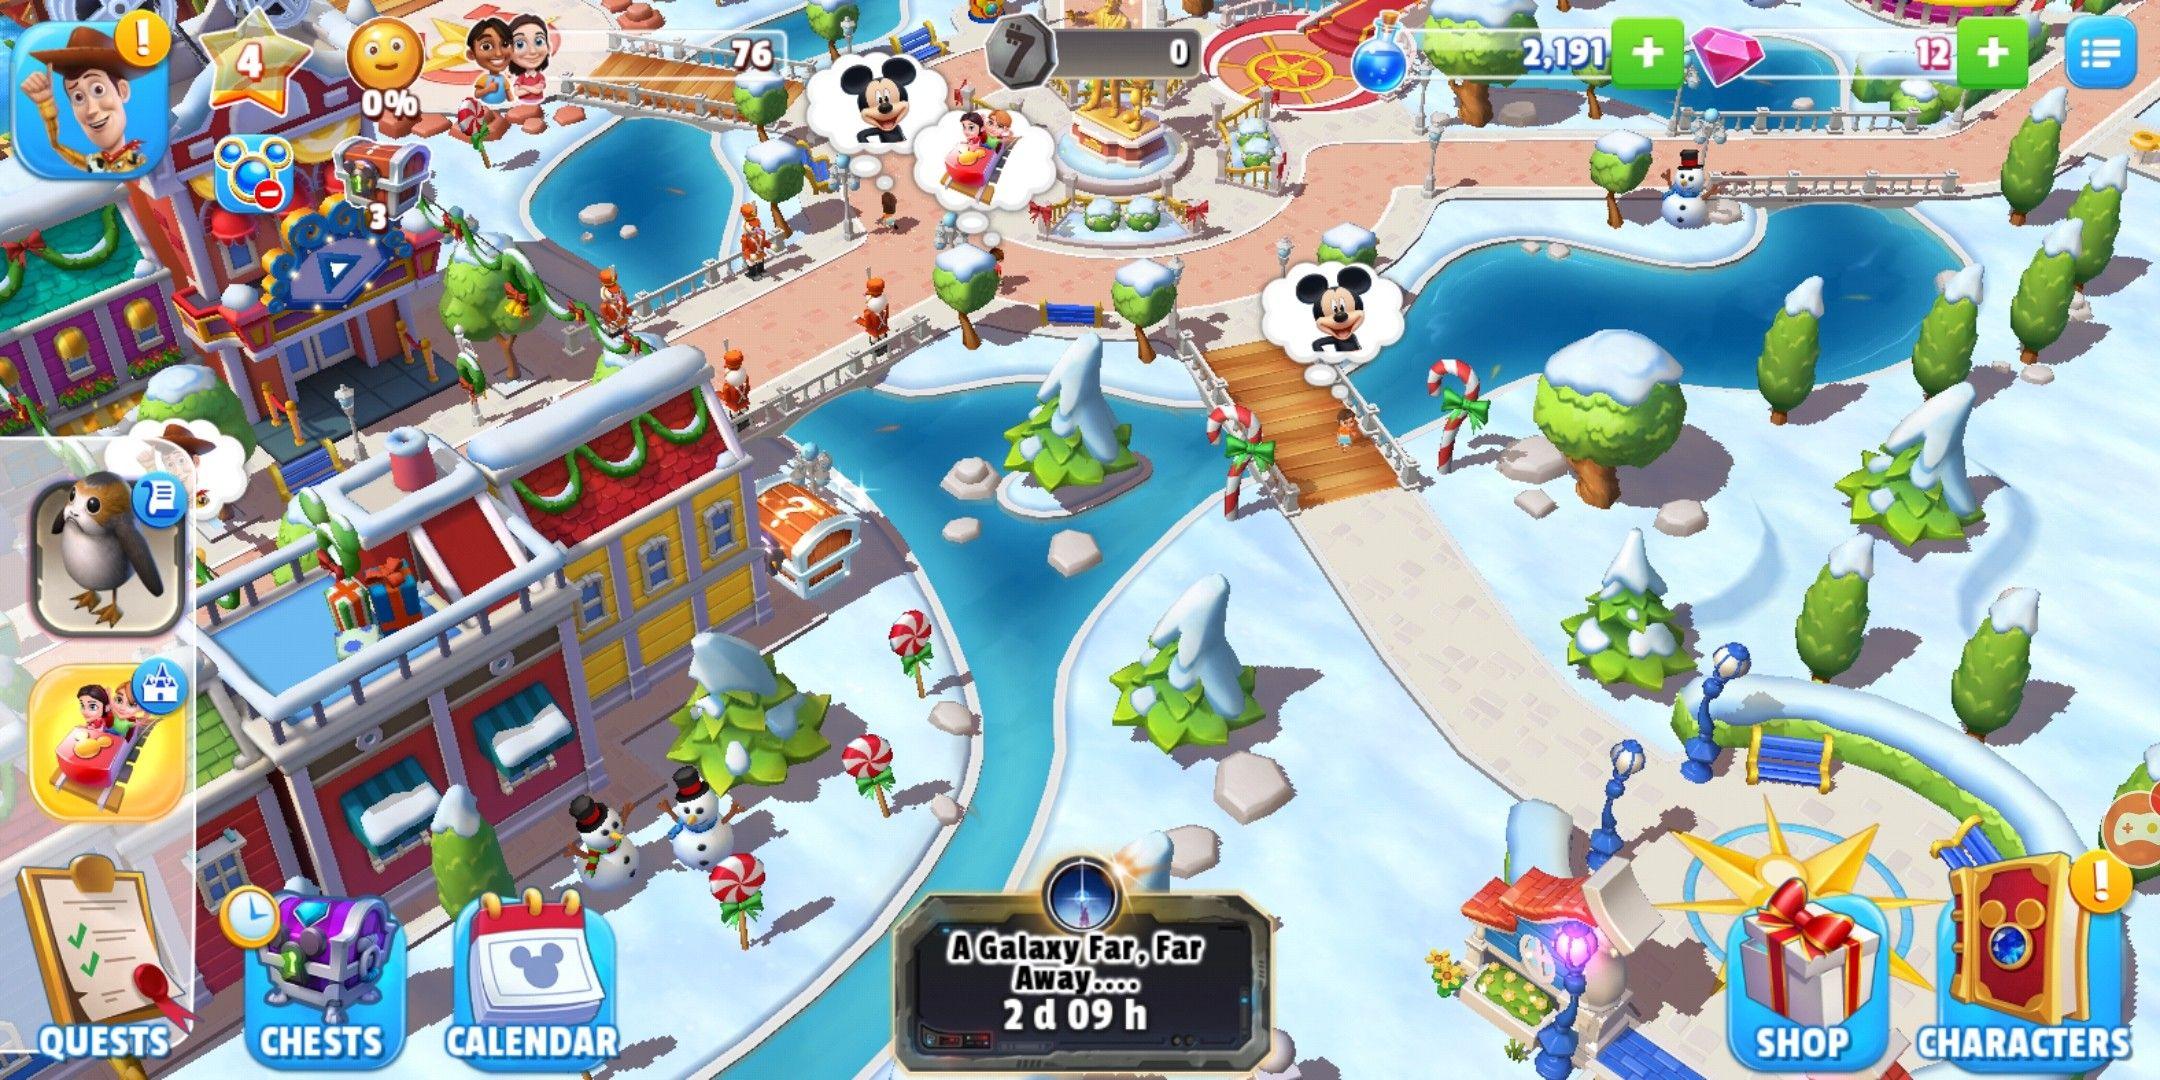 Android/iOS game in 2020 Disney magic kingdom, Disney